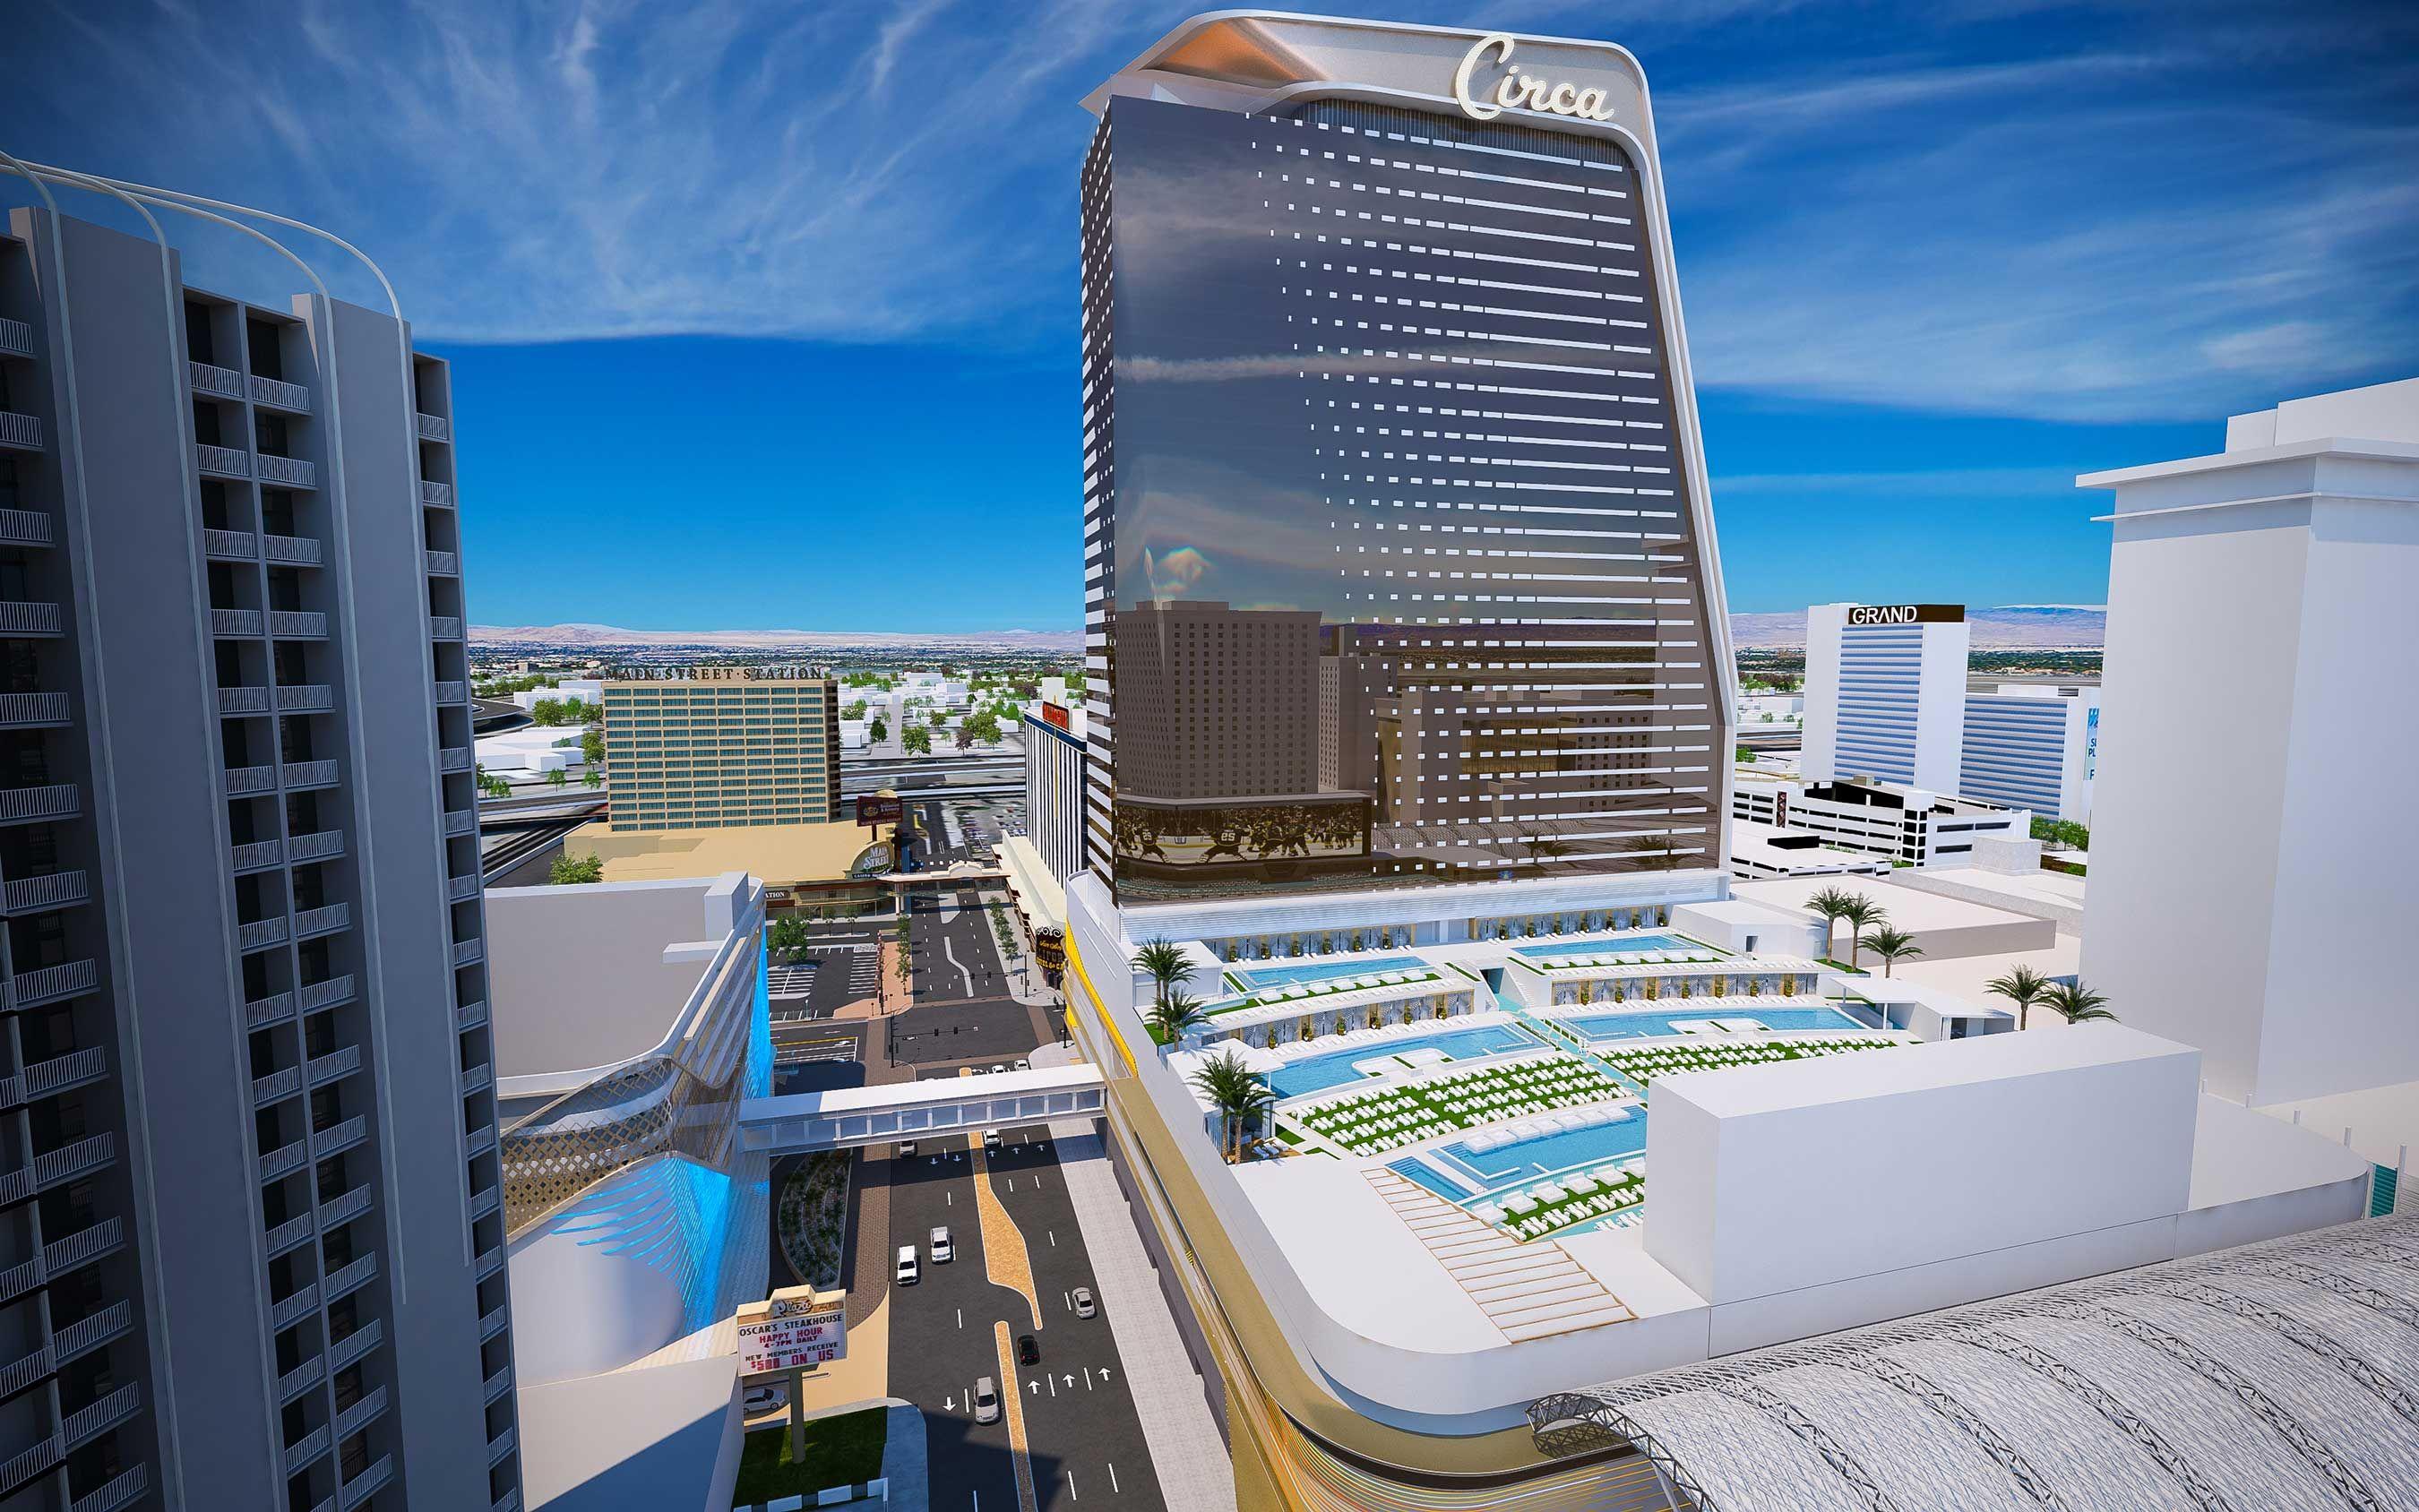 Las Vegas Future Current Hotel Construction Projects Casino Resort Casino Las Vegas